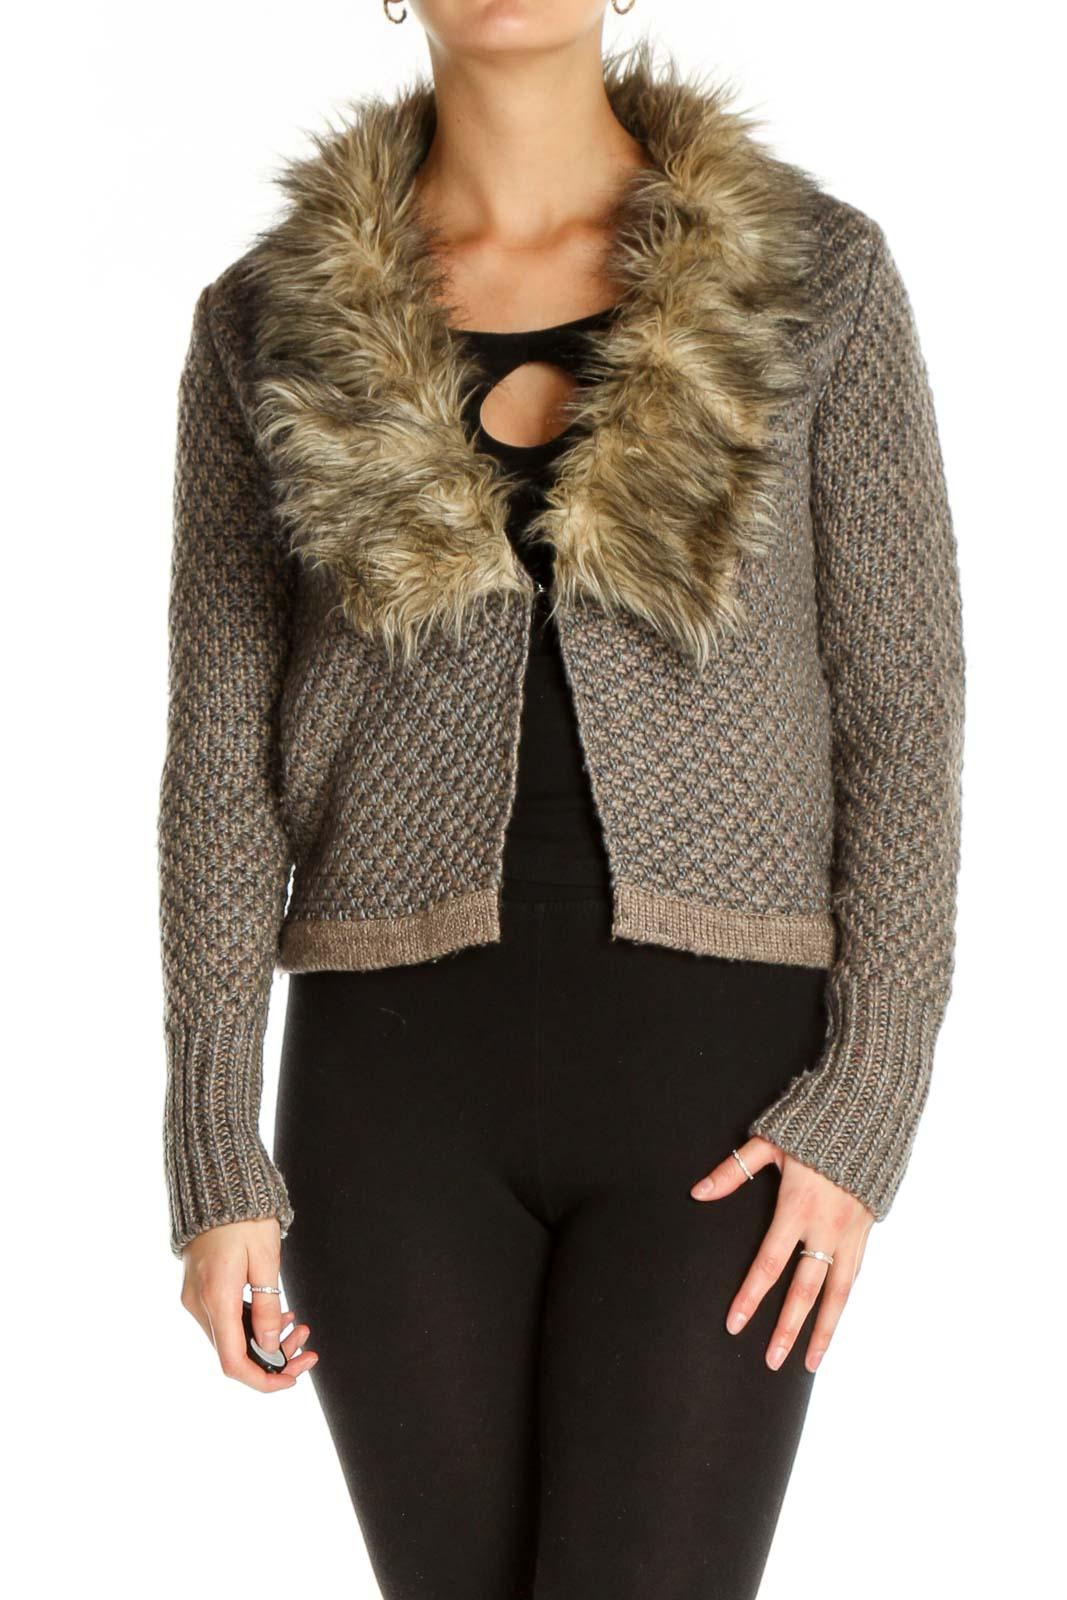 Brown Fur Jacket Front